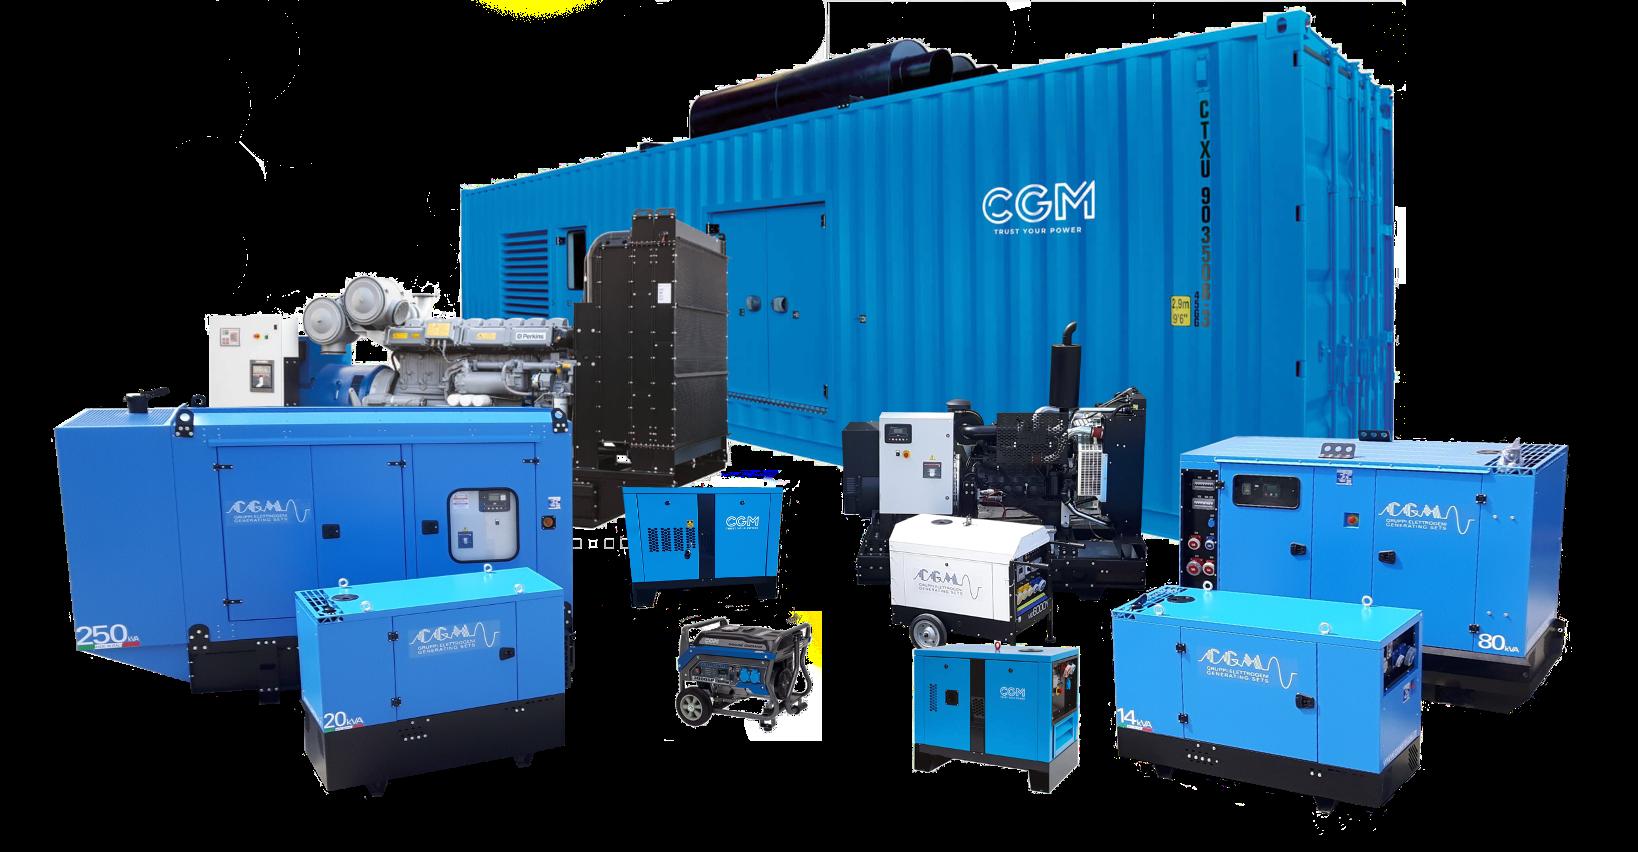 CGM backup generator sales